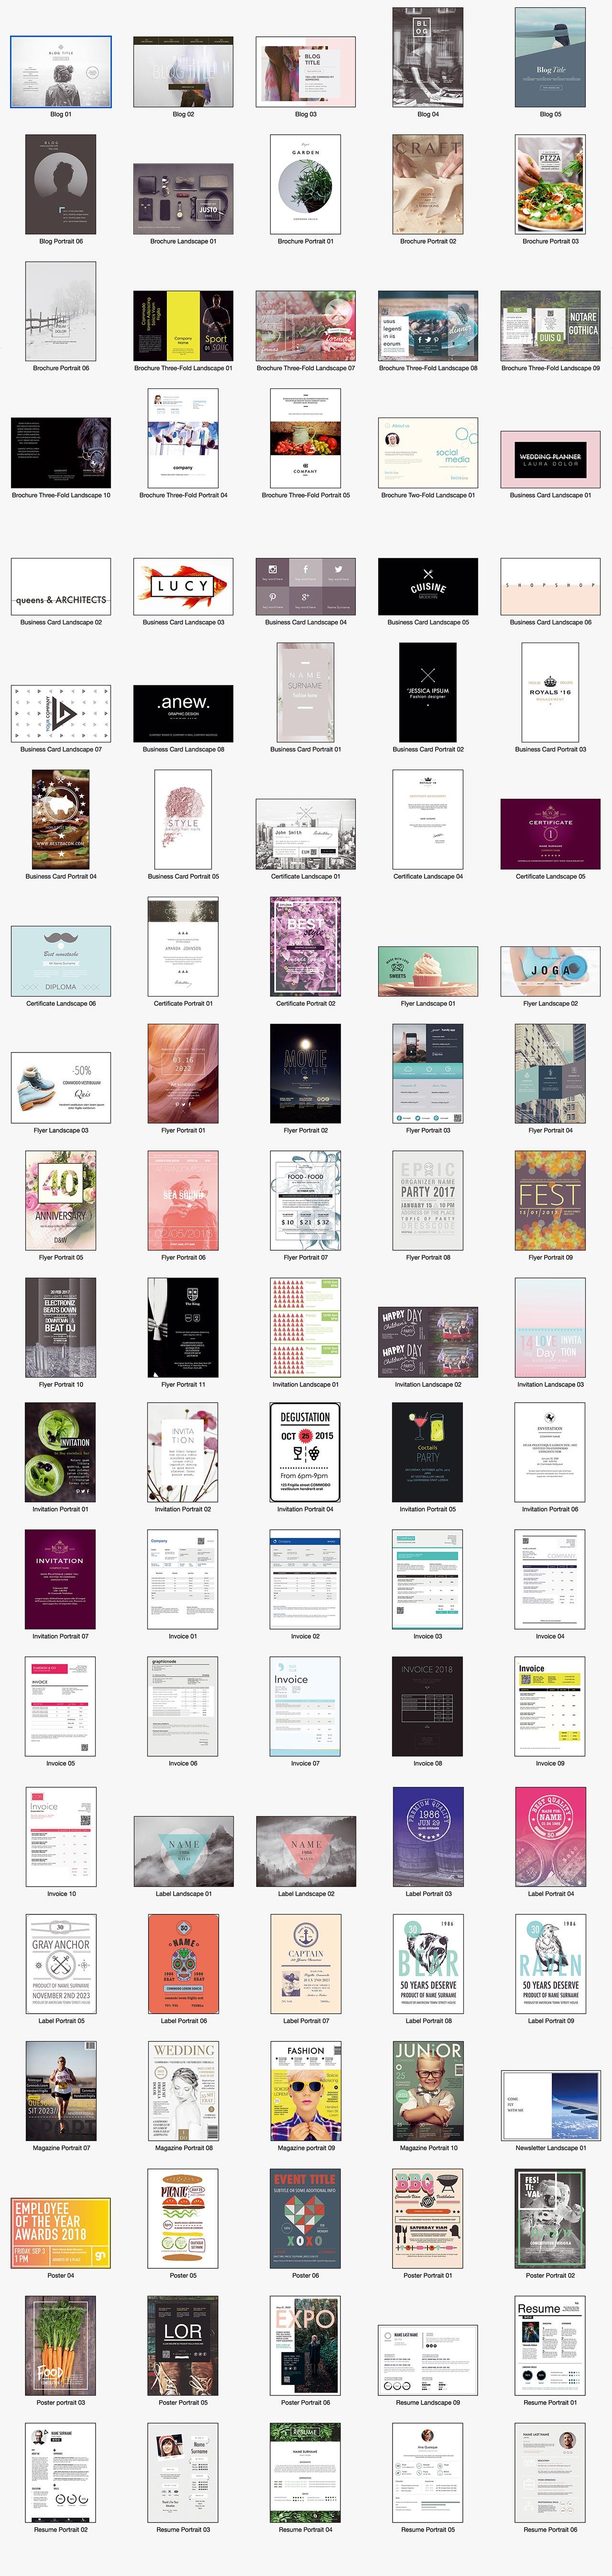 Templates for InDesign - Alungu Designs高品质的indesign模版下载[For Mac2.0.1]